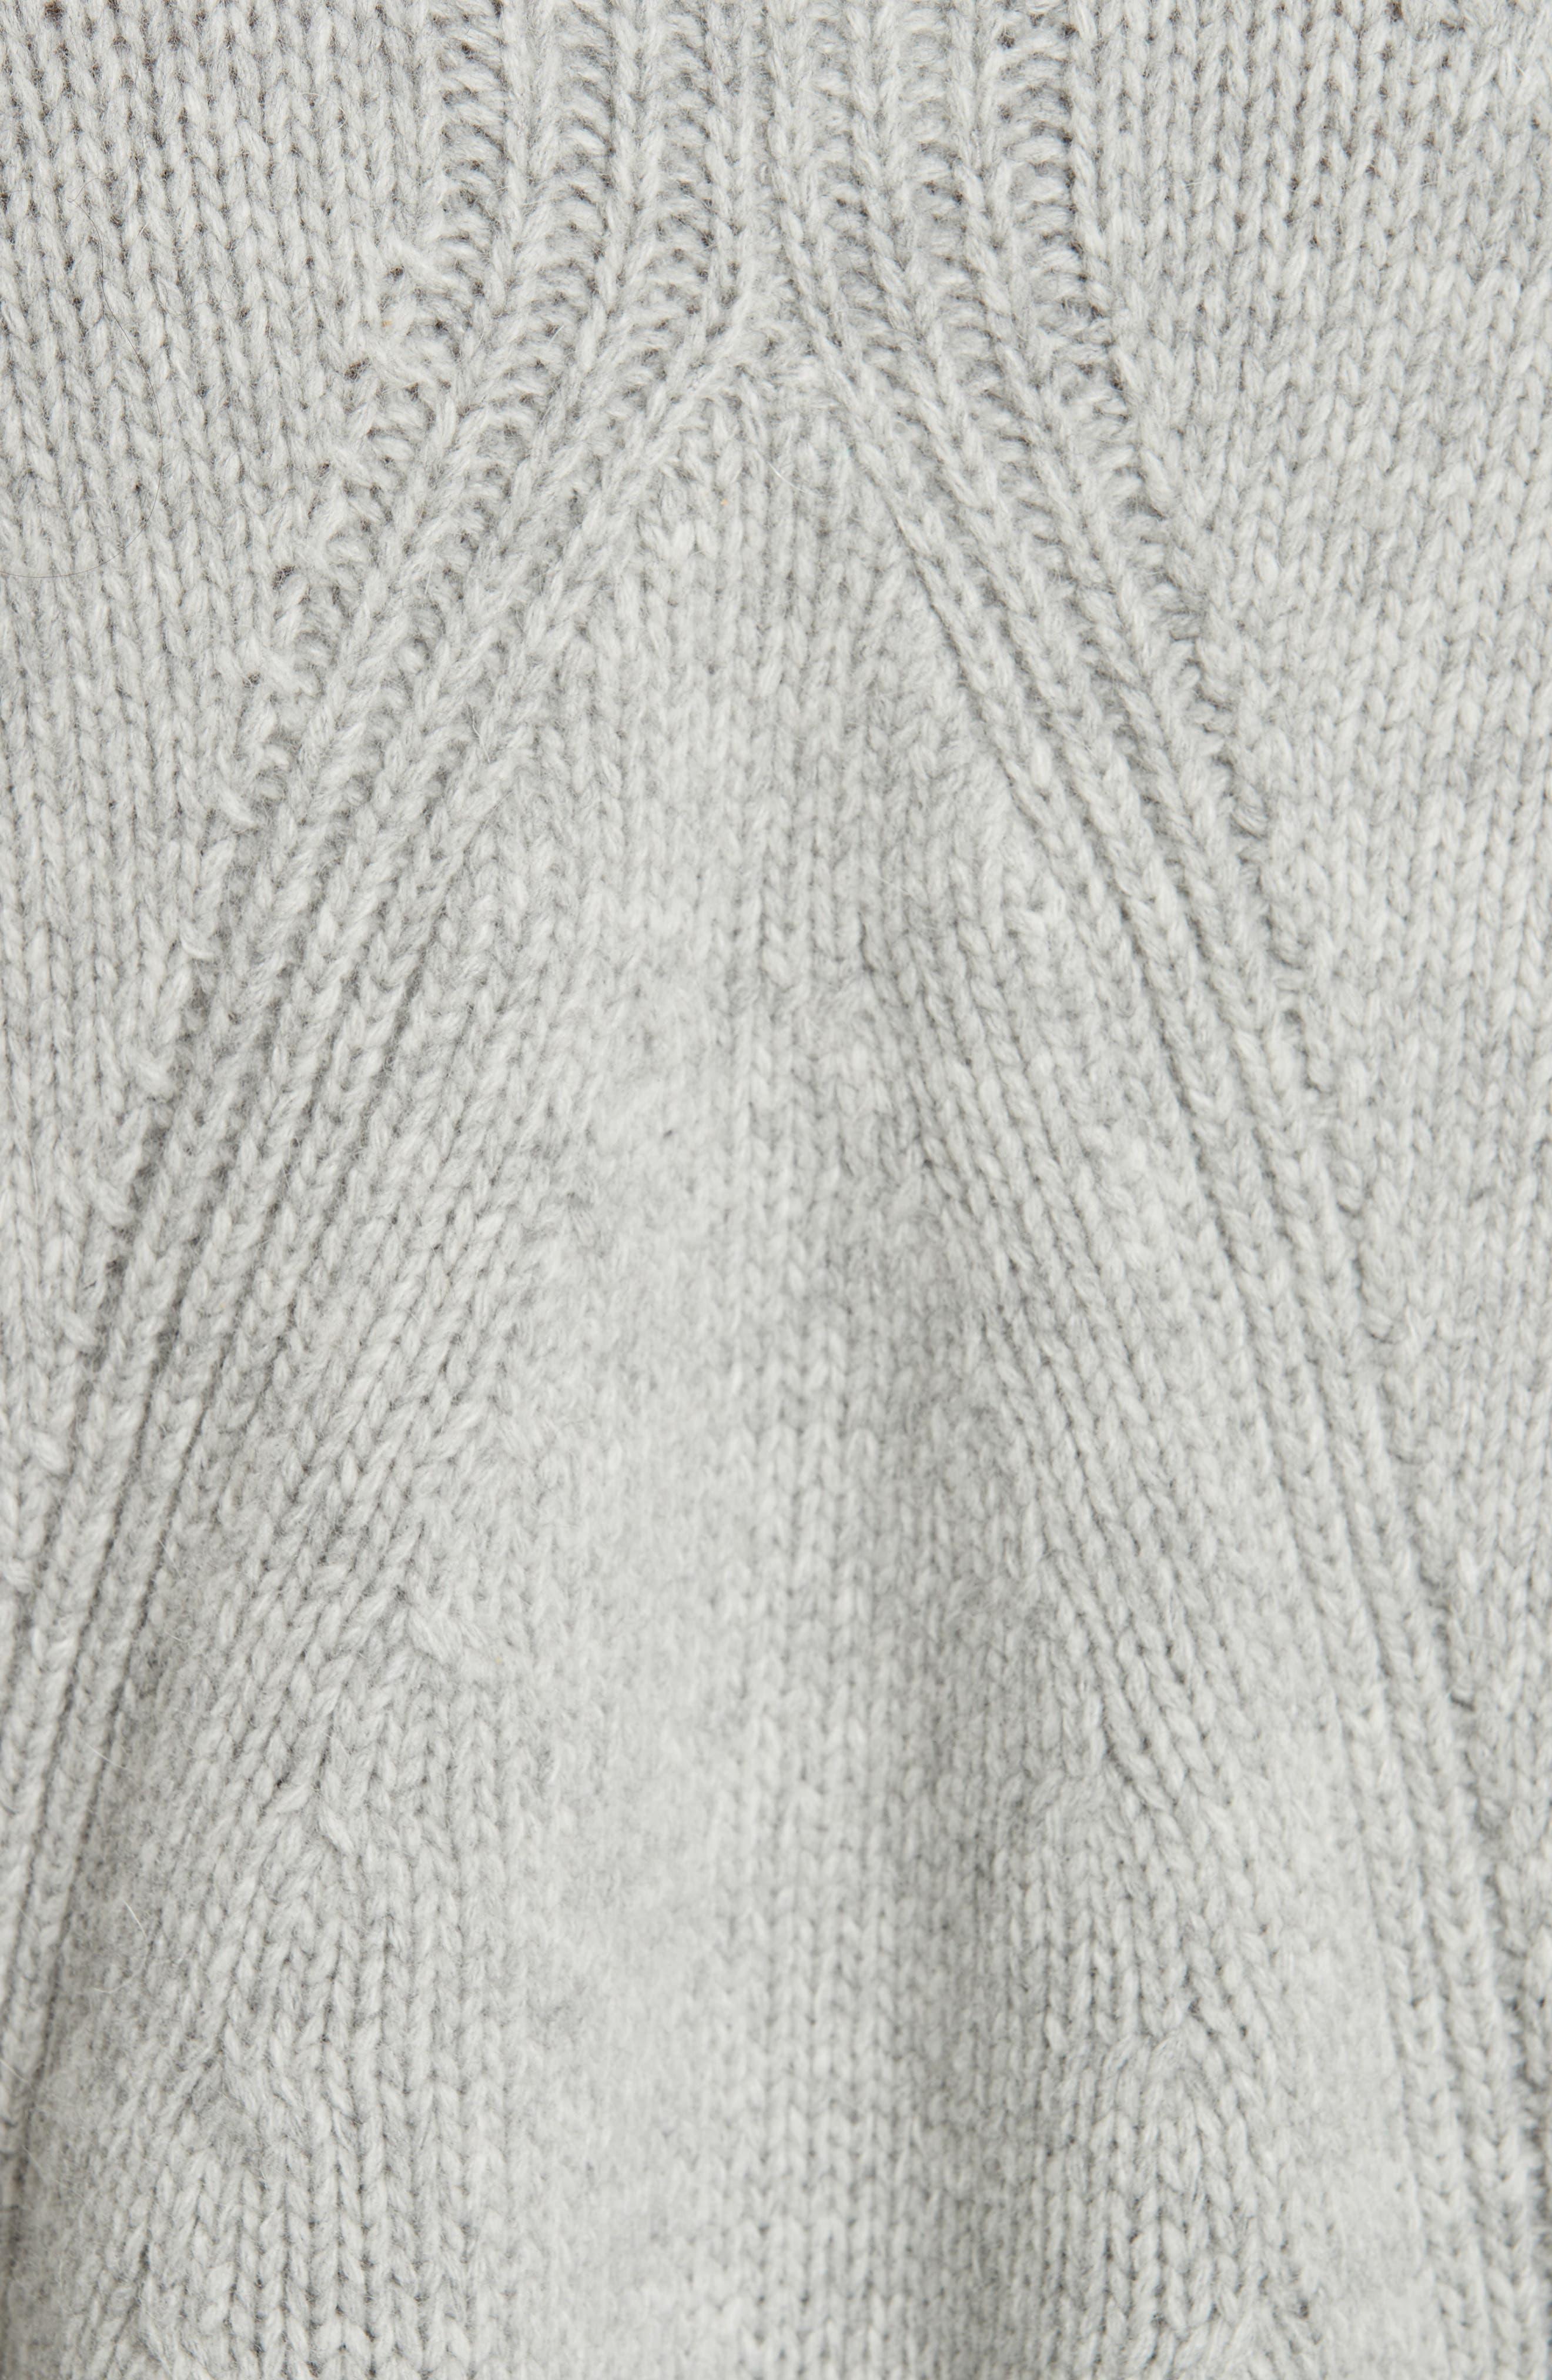 Nagora Sweater,                             Alternate thumbnail 5, color,                             020